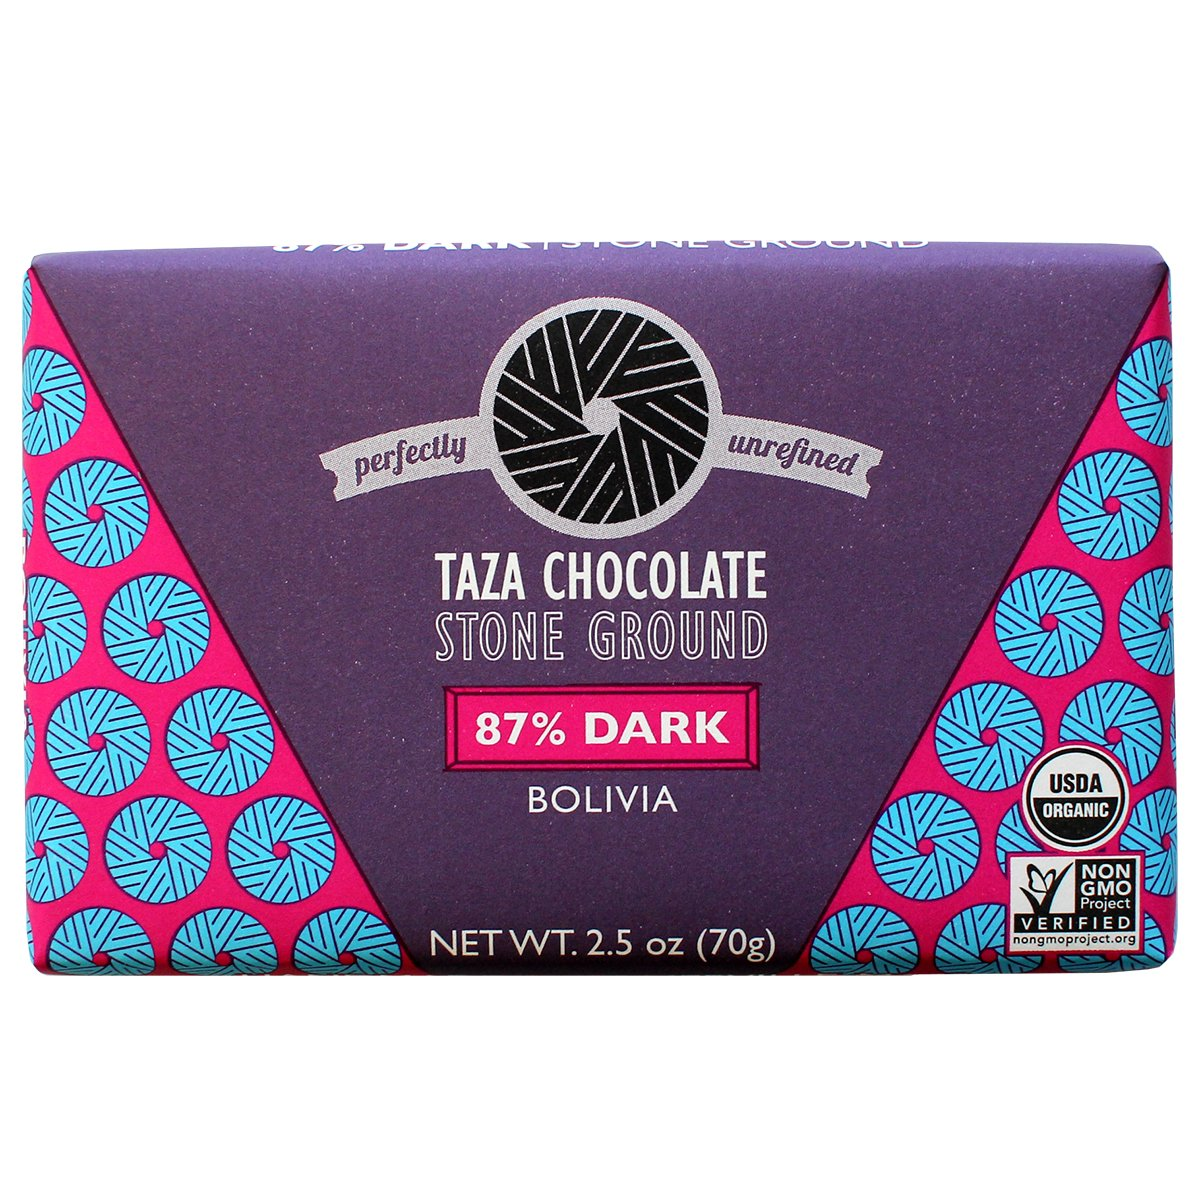 CDM product Taza Chocolate Organic Origin Bar 87% Dark Stone Ground, Bolivia, 3 Ounce (Pack of 10), Vegan big image